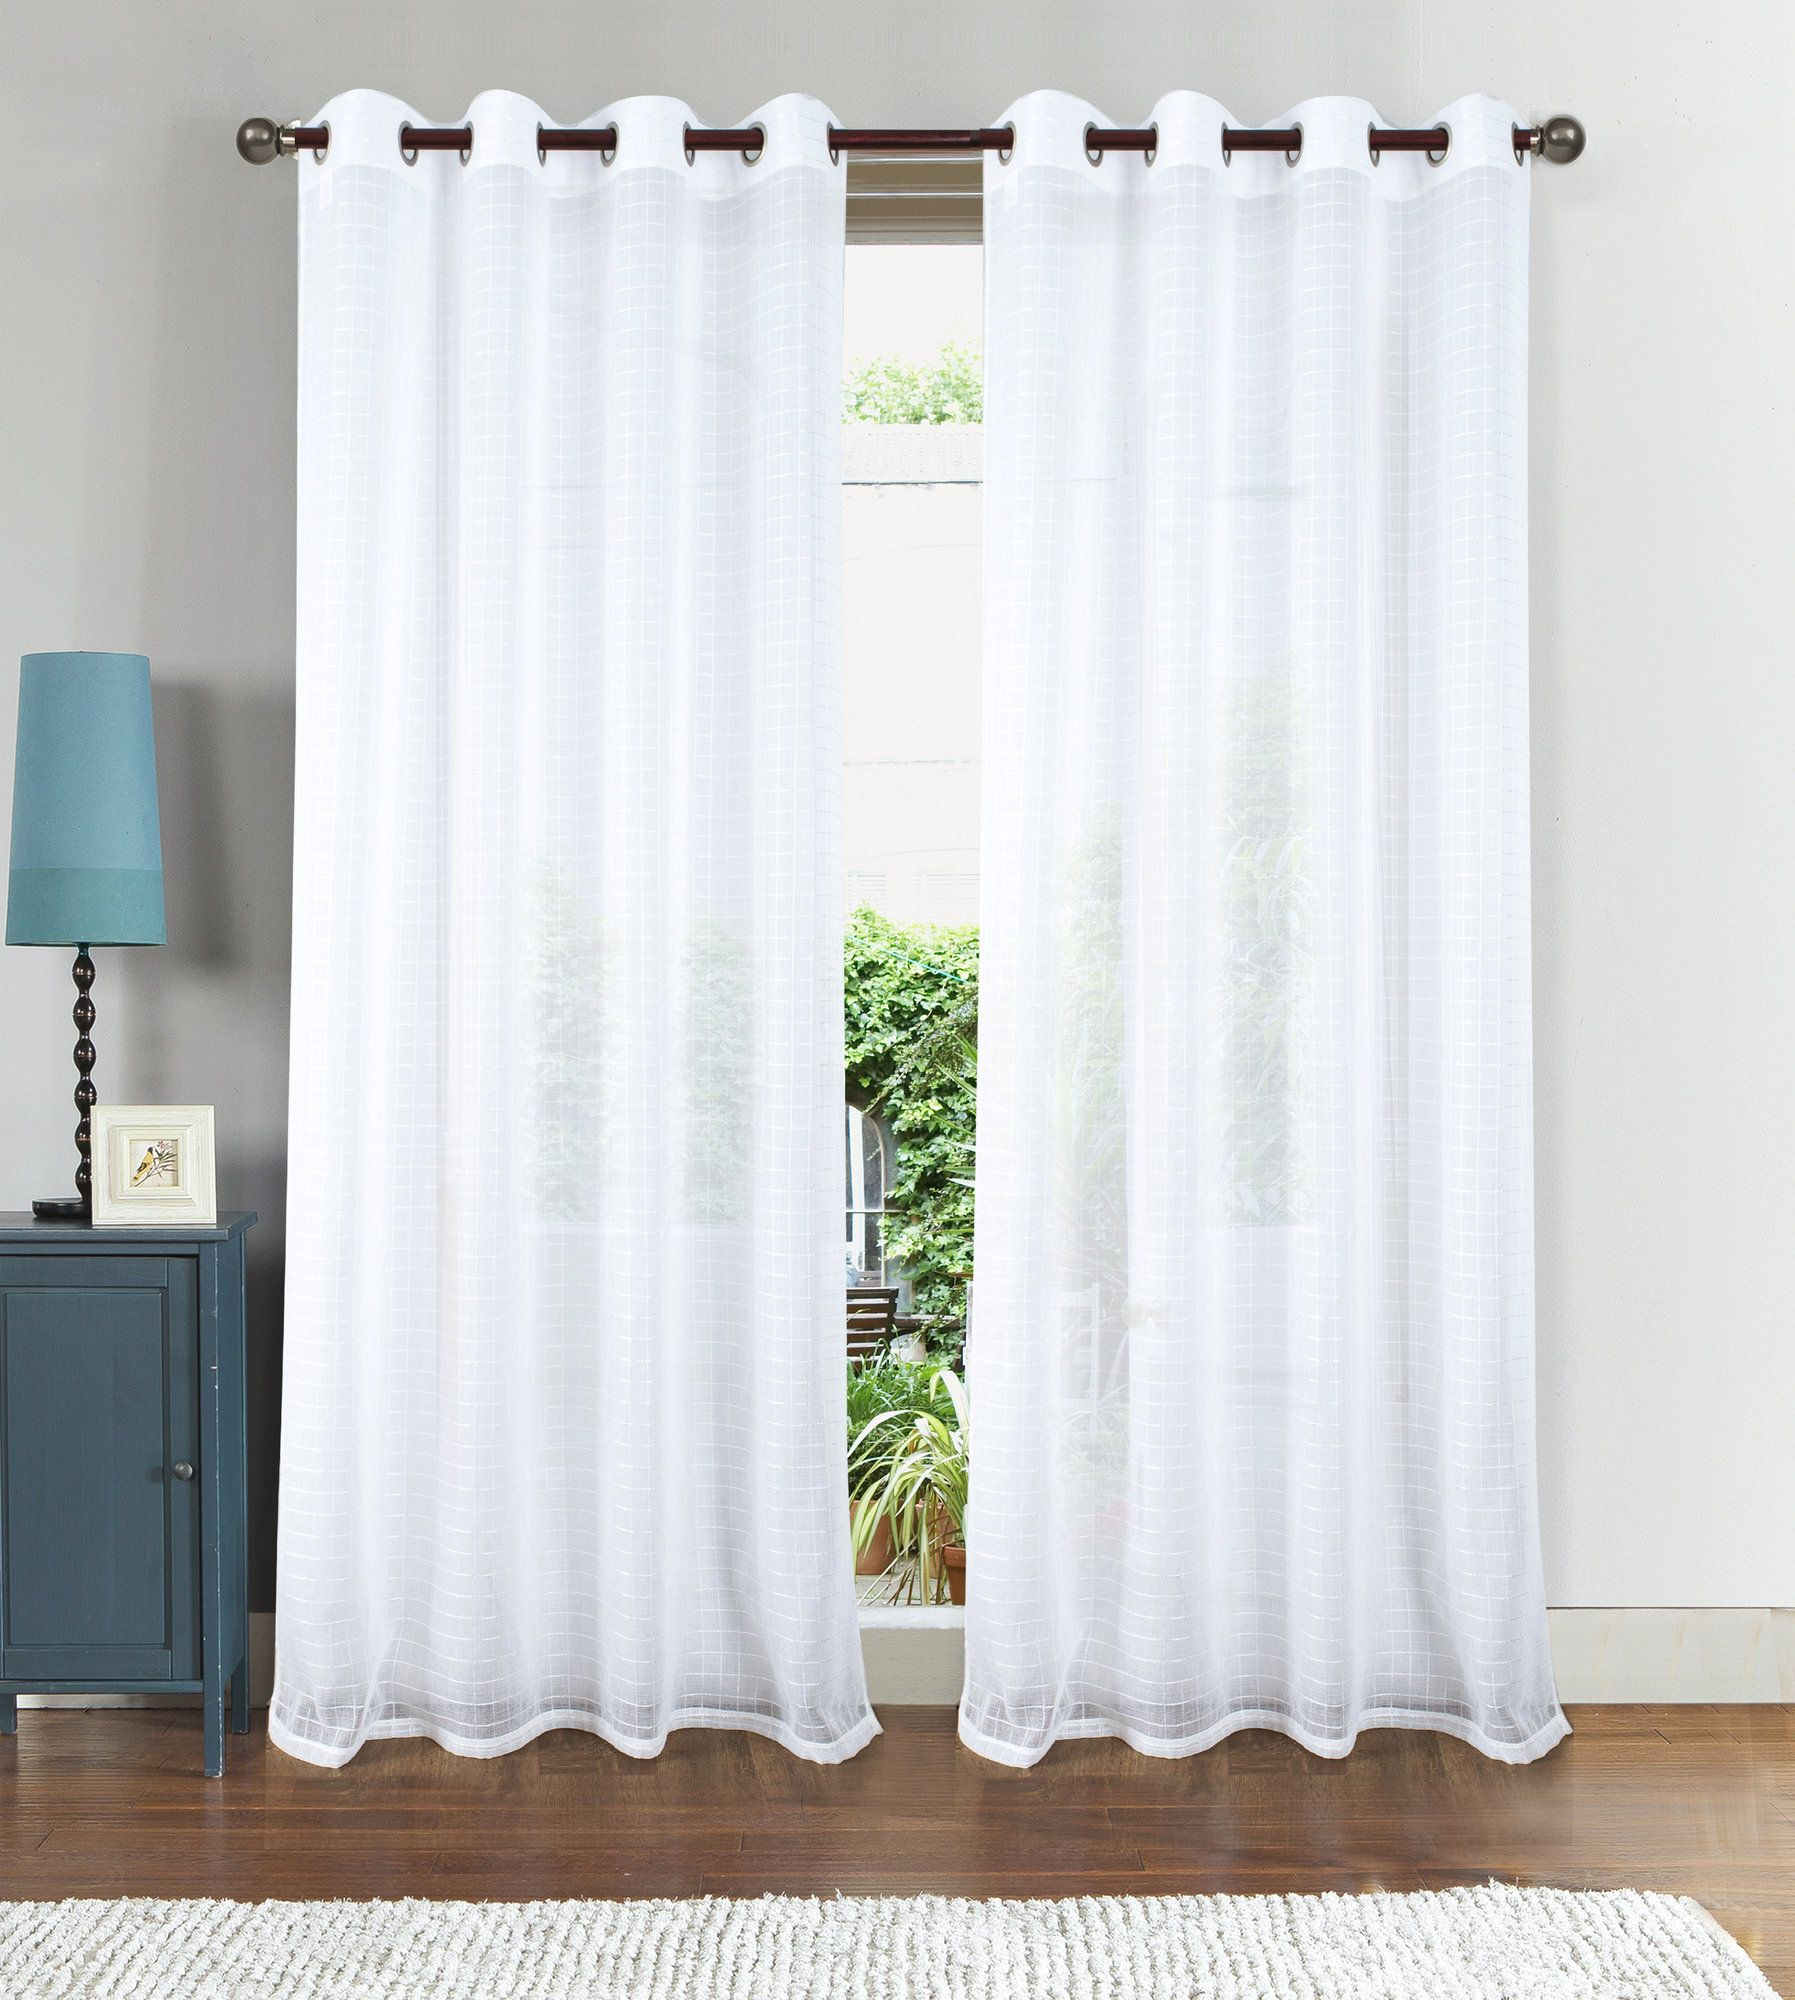 Nile Box Doily Grommet Single Curtain Panel